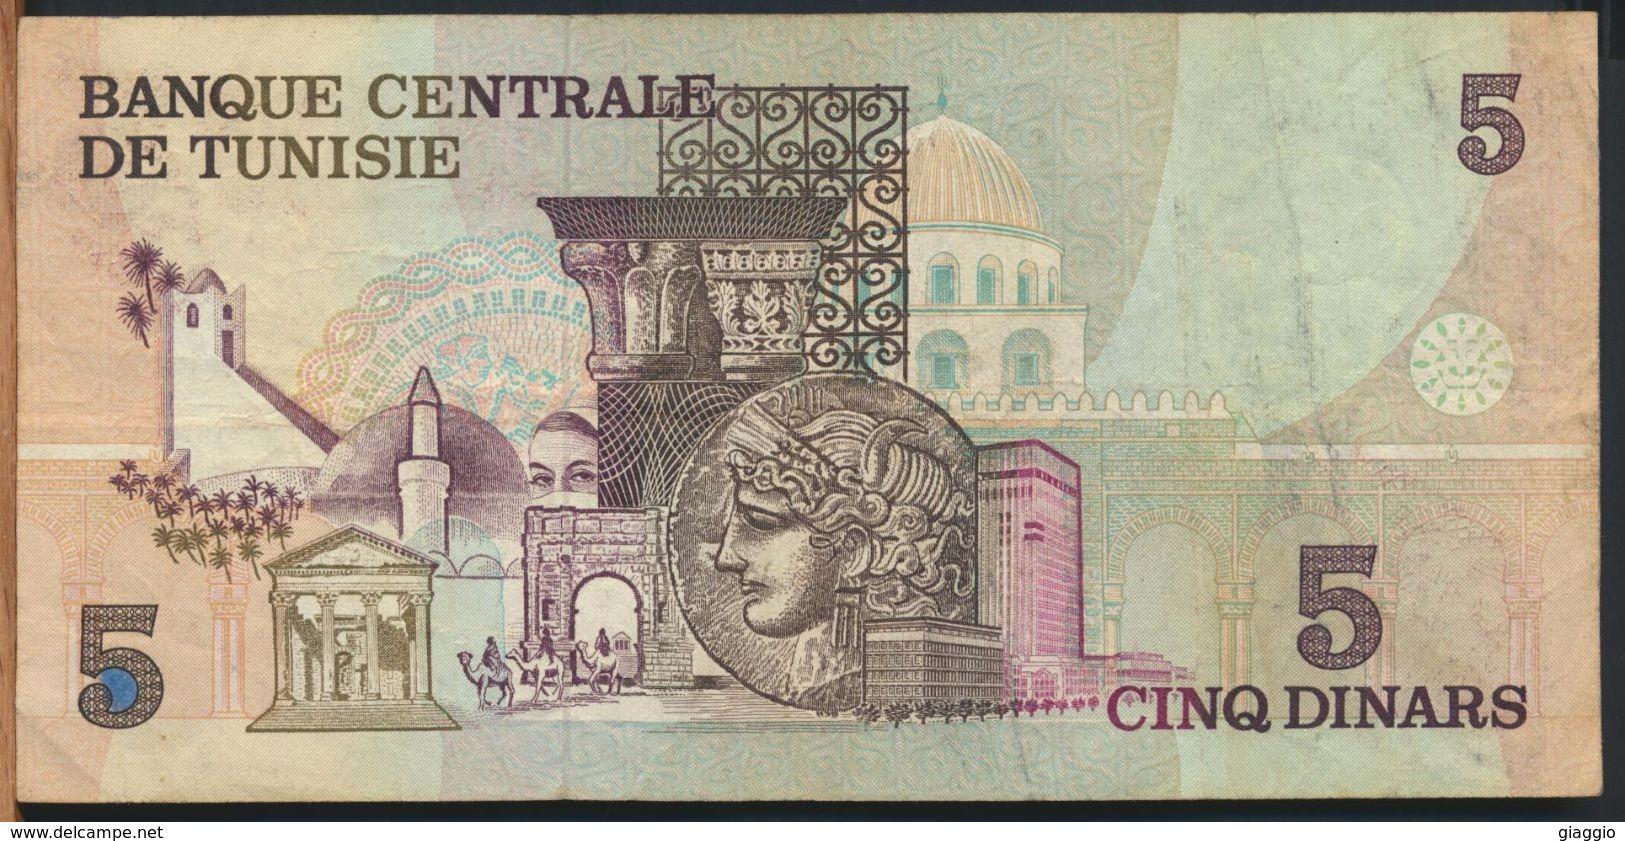 °°° TUNISIE TUNISIA - 5 DINARS 1973 °°° - Tunisia